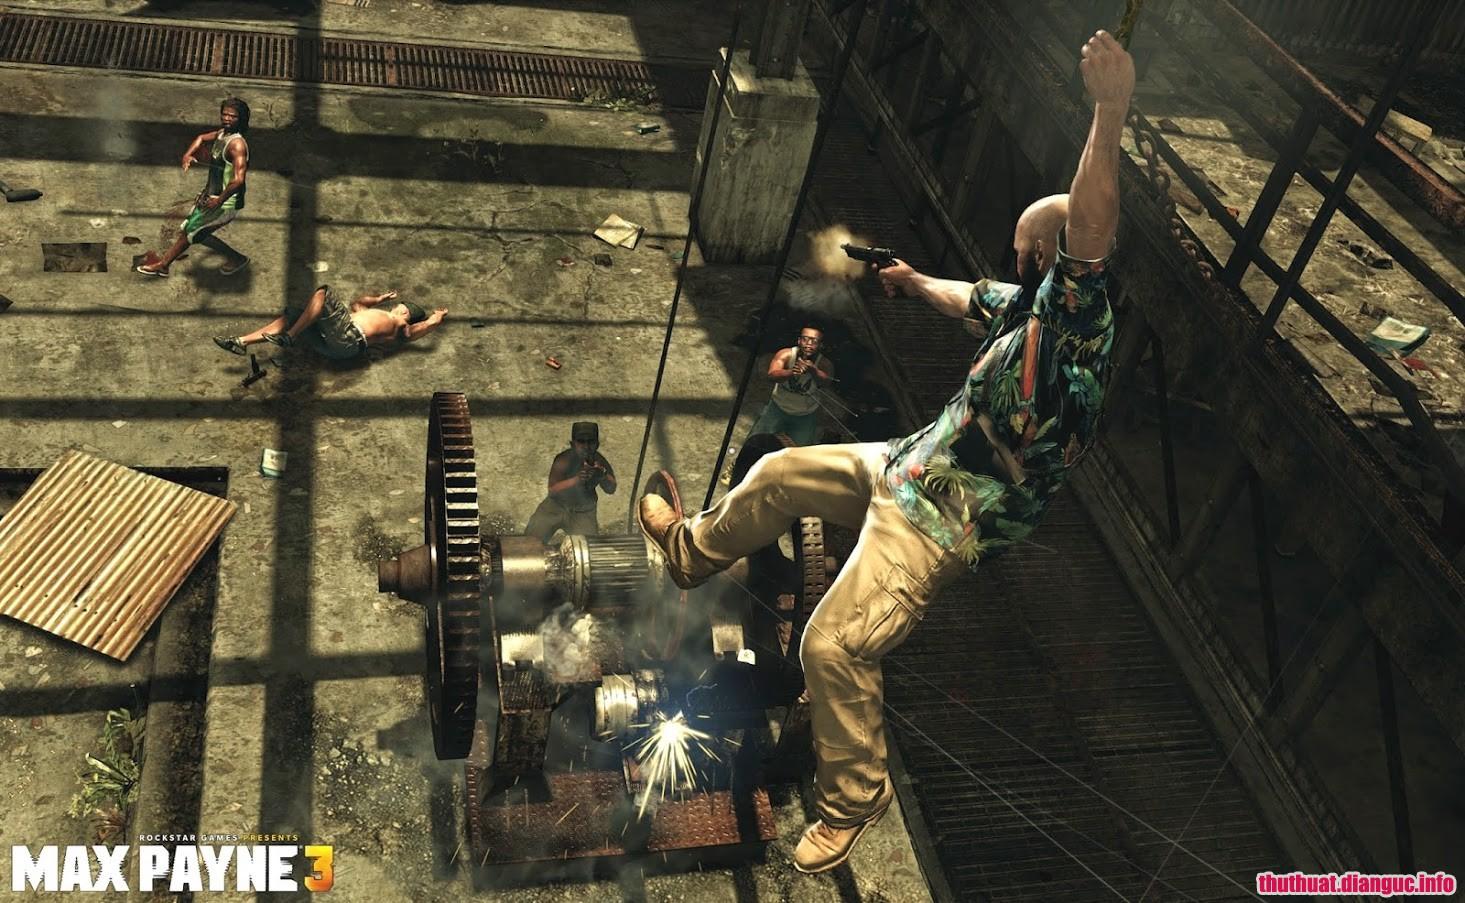 Max Payne 3 Full free download